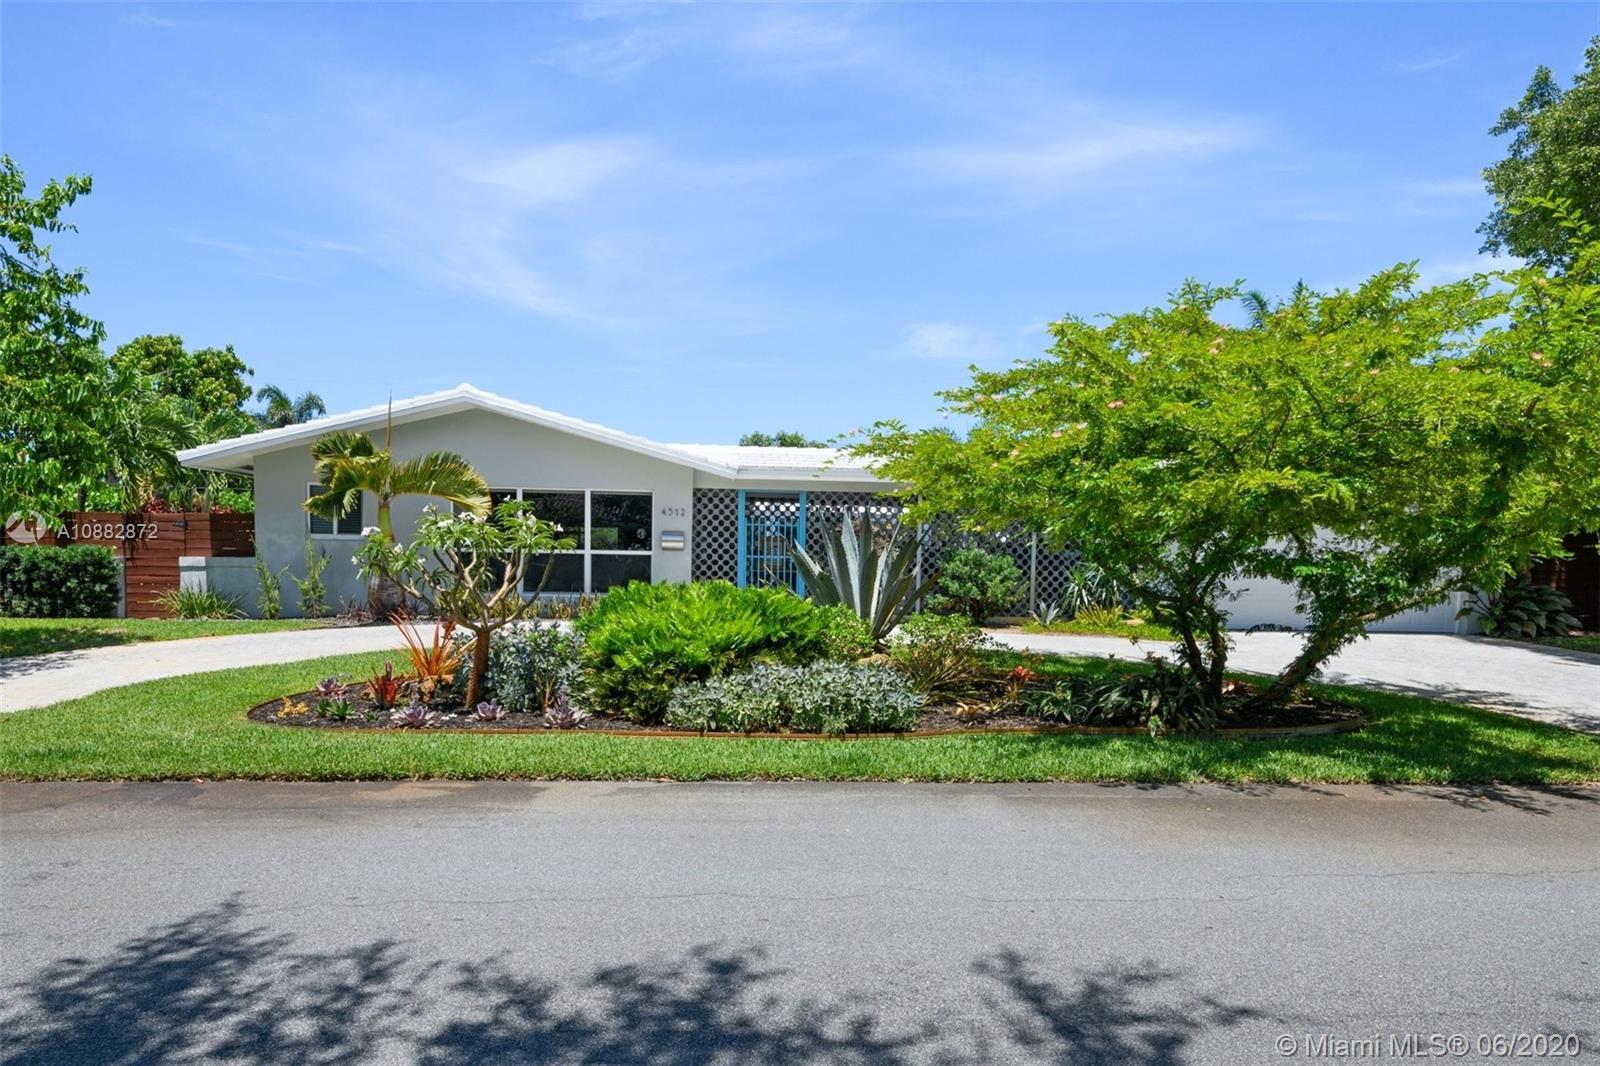 4512 NE 21st Ln Property Photo - Fort Lauderdale, FL real estate listing